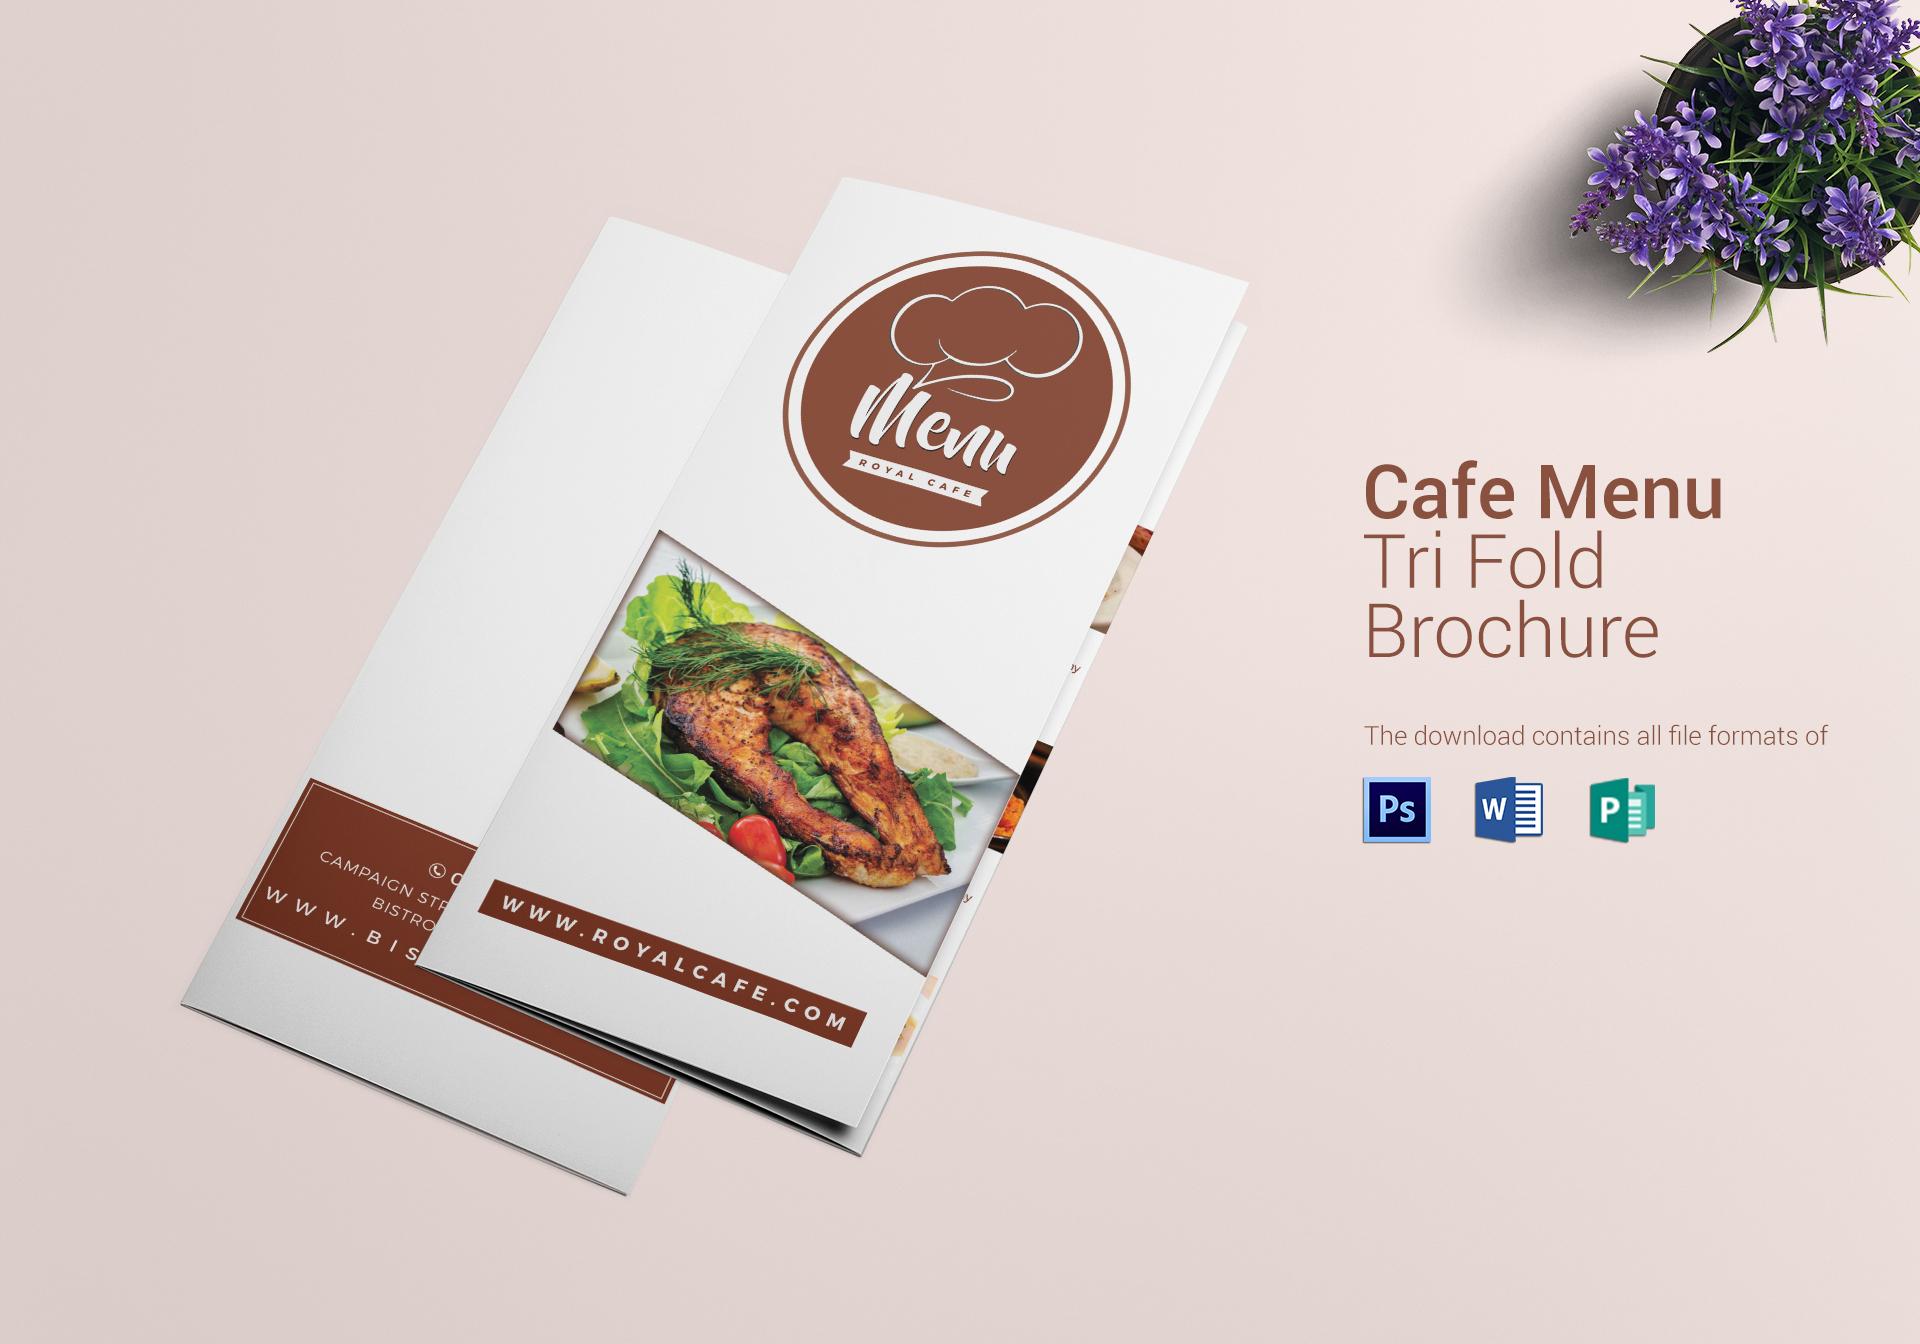 restro cafe trifold menu sample